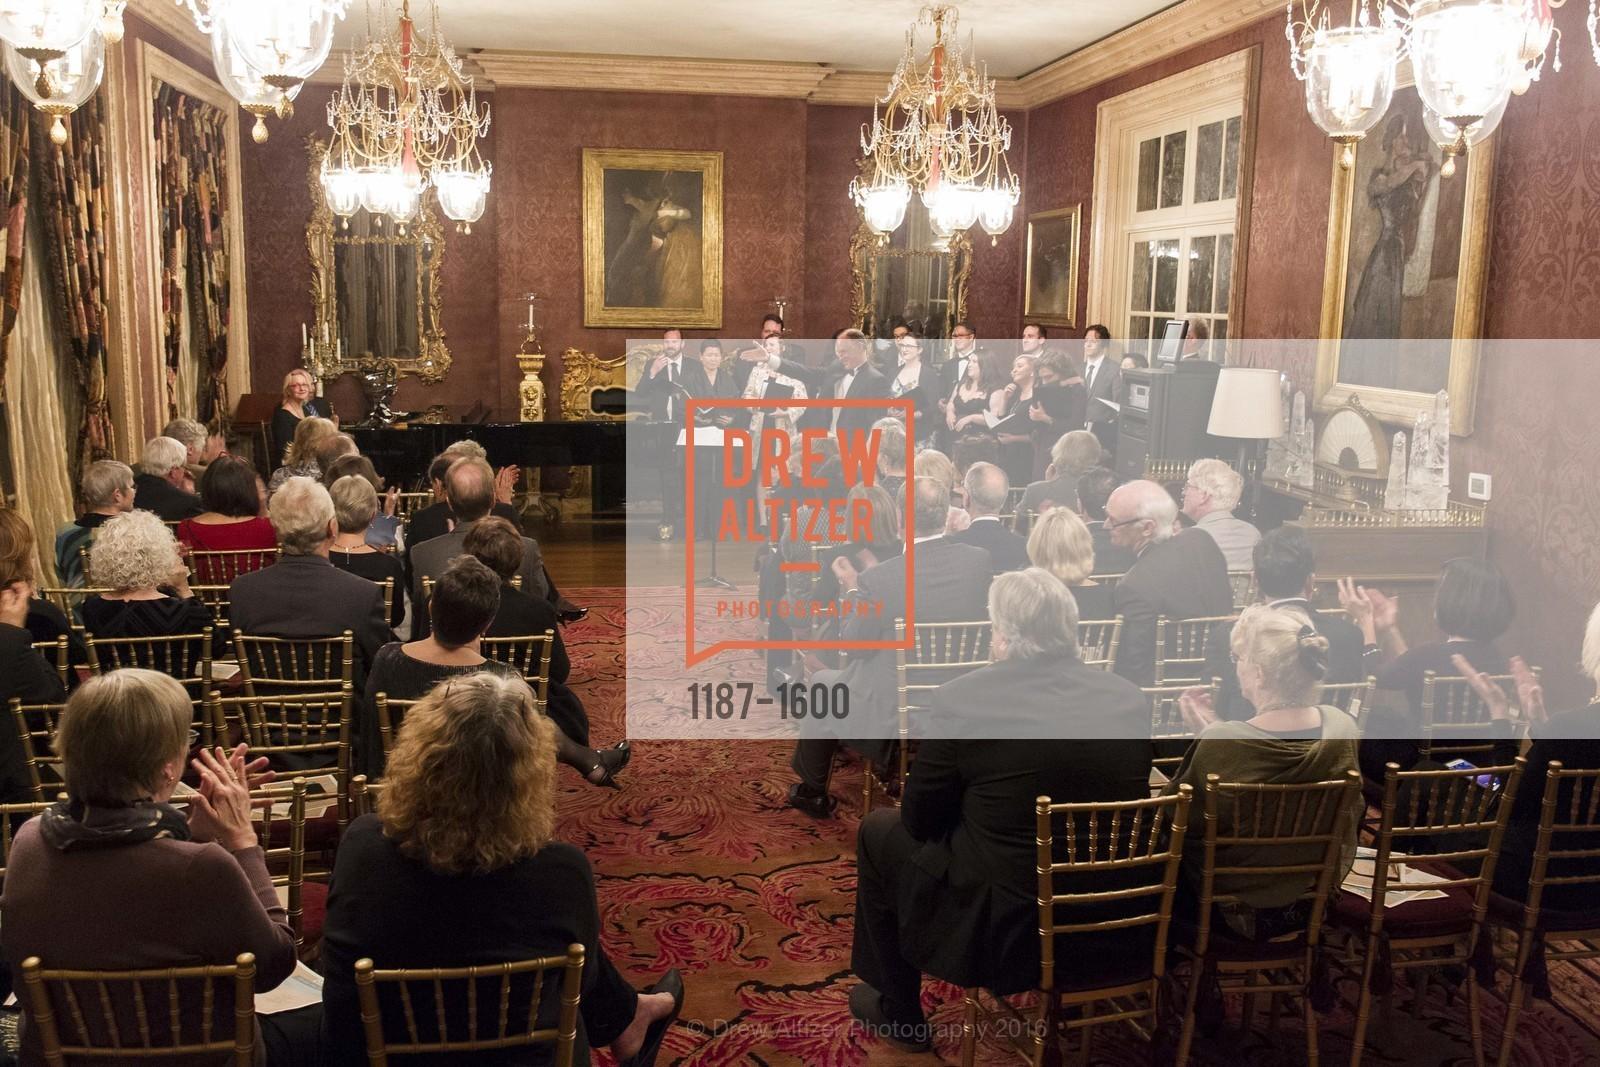 Volti SF Chamber Chorus, Photo #1187-1600